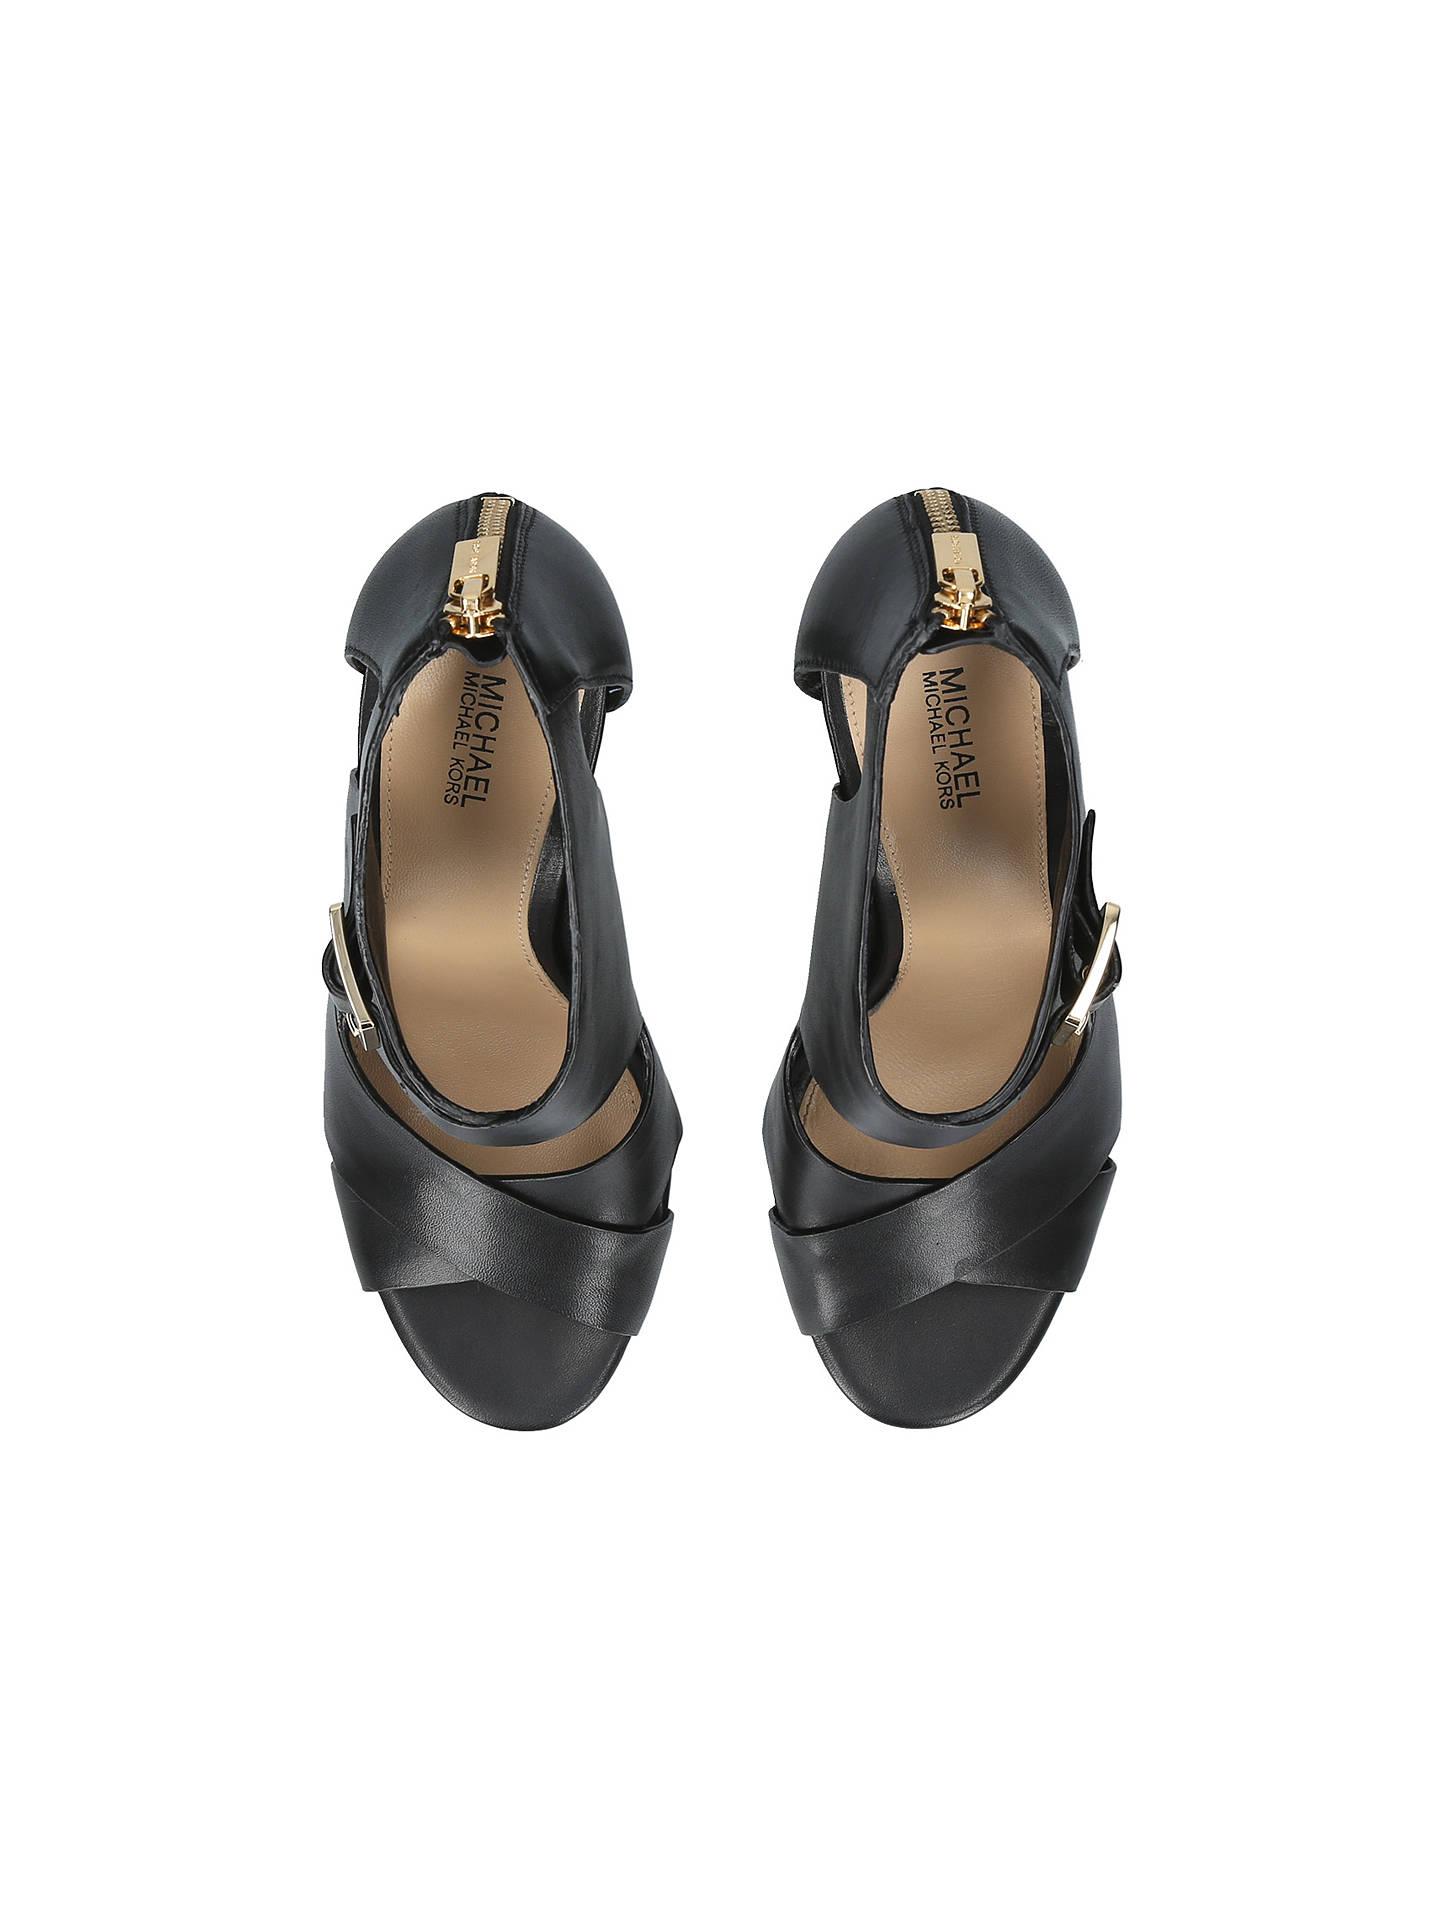 25a62e0fb8bf MICHAEL Michael Kors Kimber Stiletto Heeled Sandals at John Lewis ...